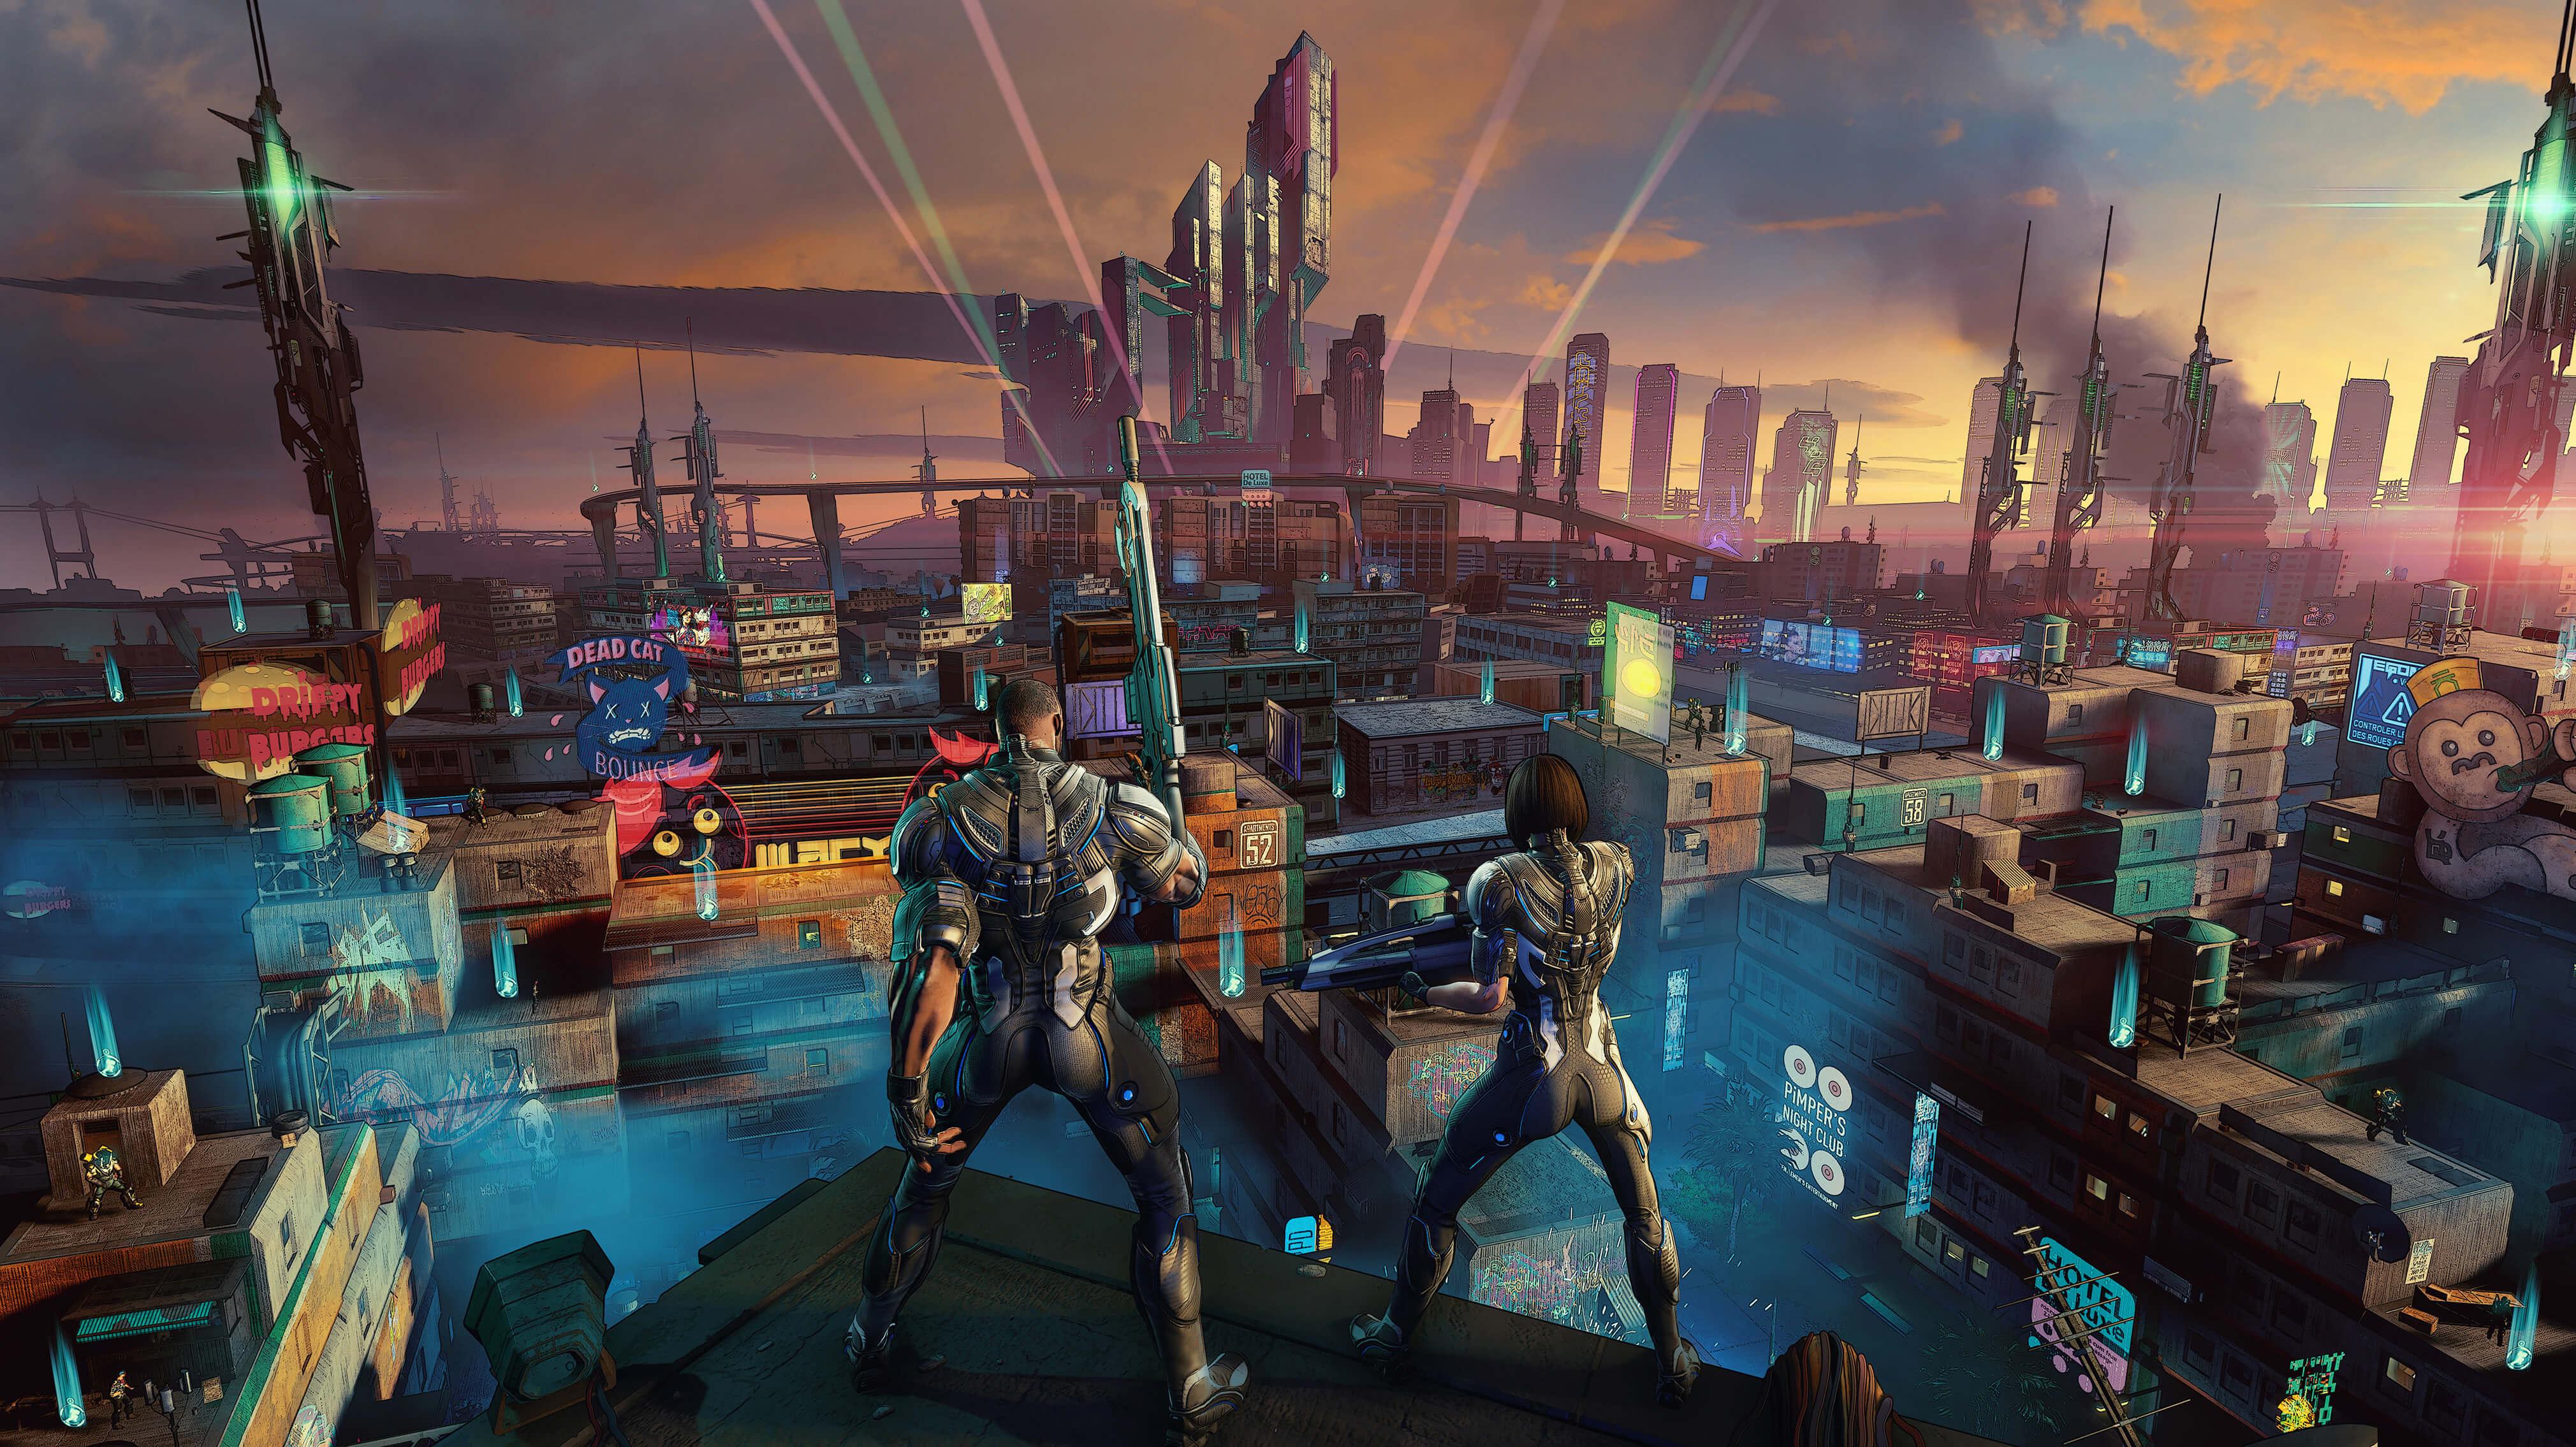 crackdown 3 game widescreen wallpaper 67130